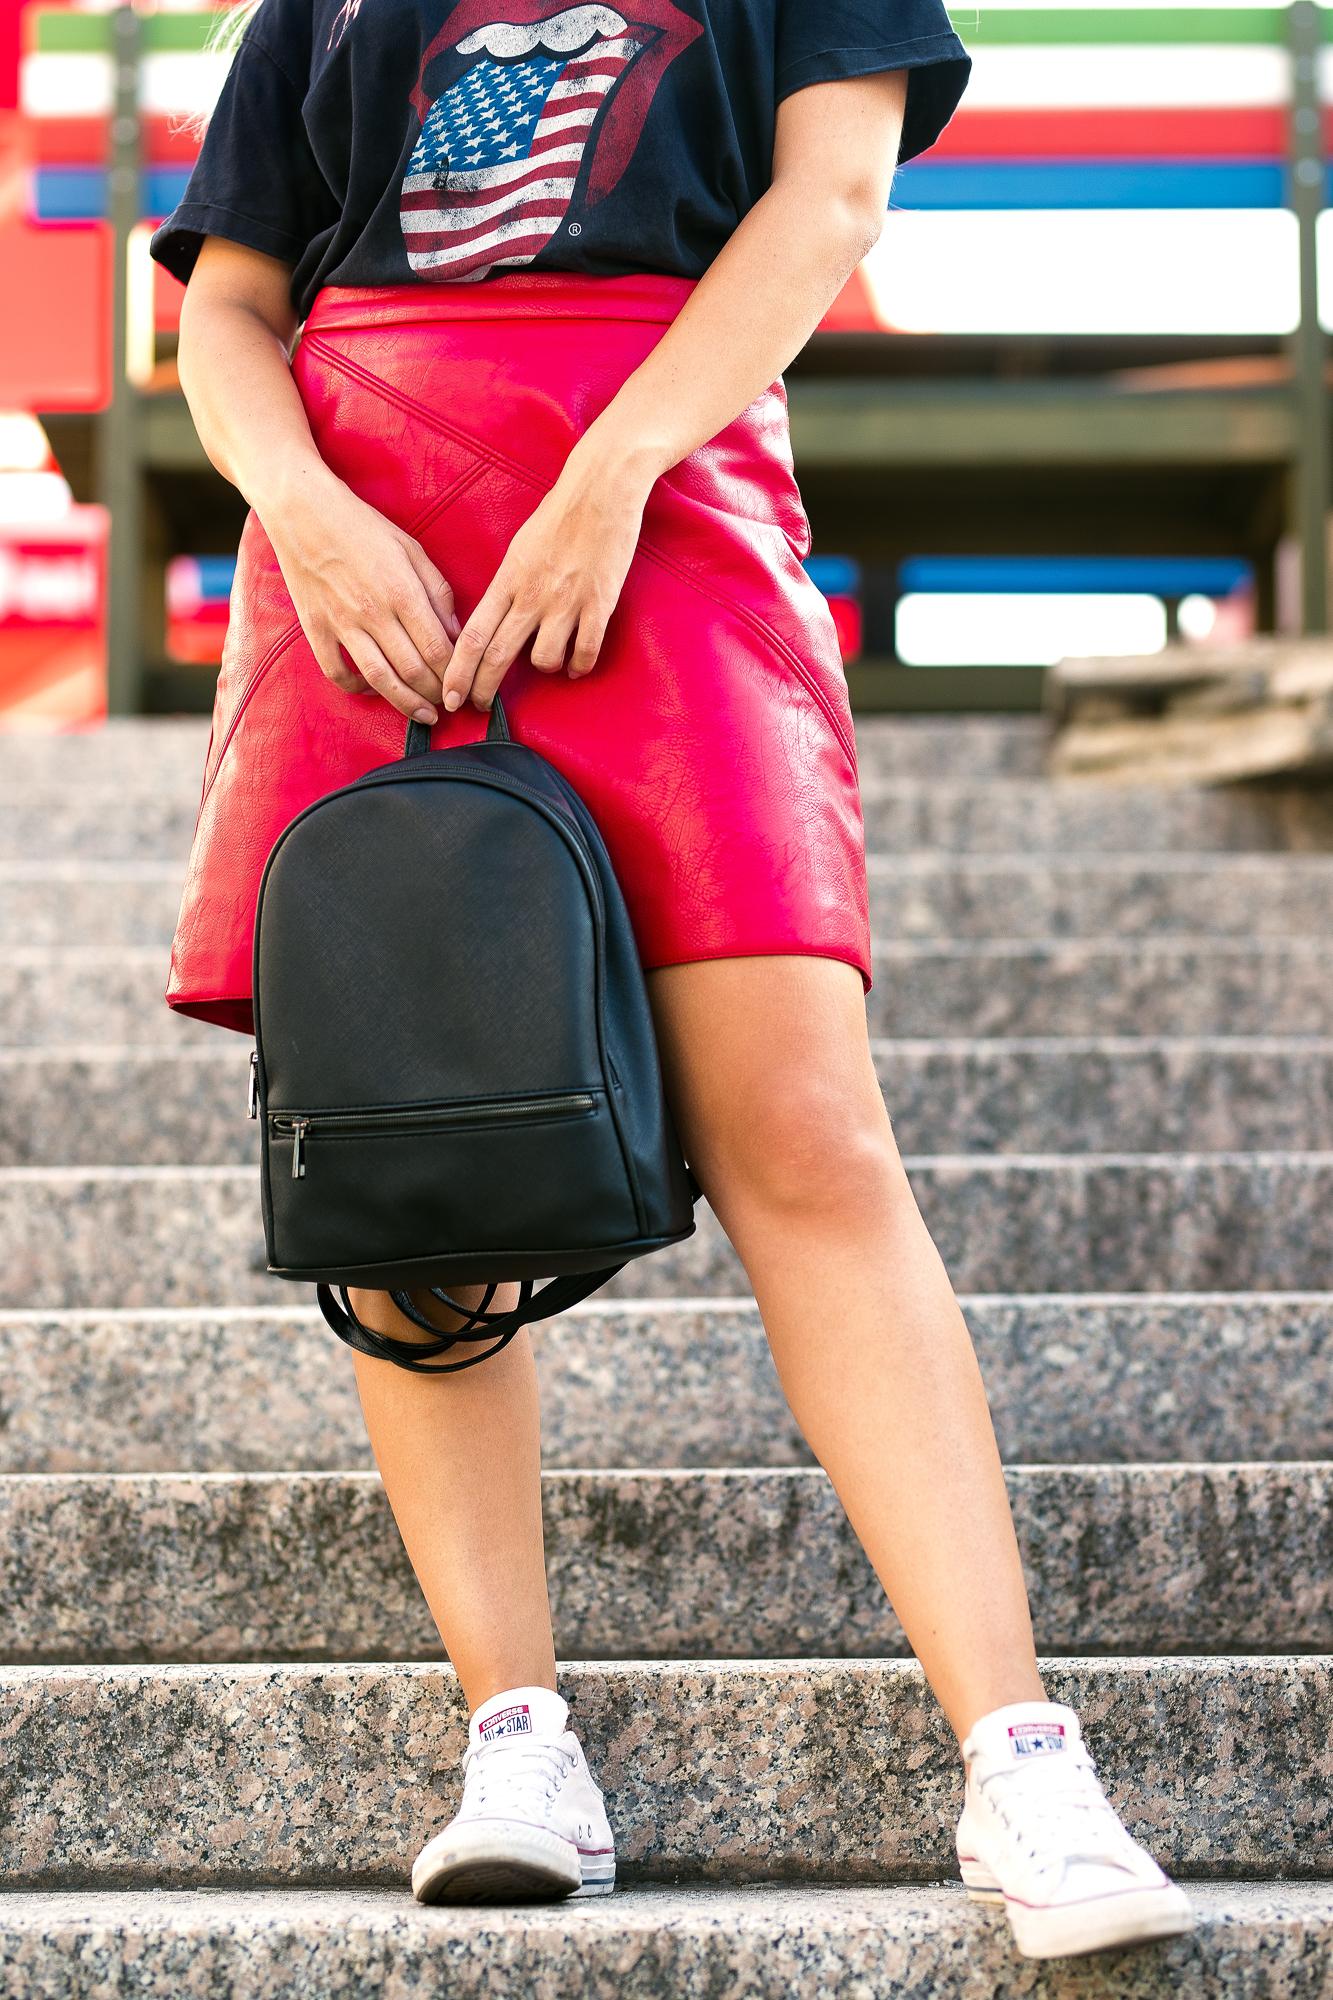 dezire blogeri slovenske blogerky moda fashion slovensko bratislava dnesnosim